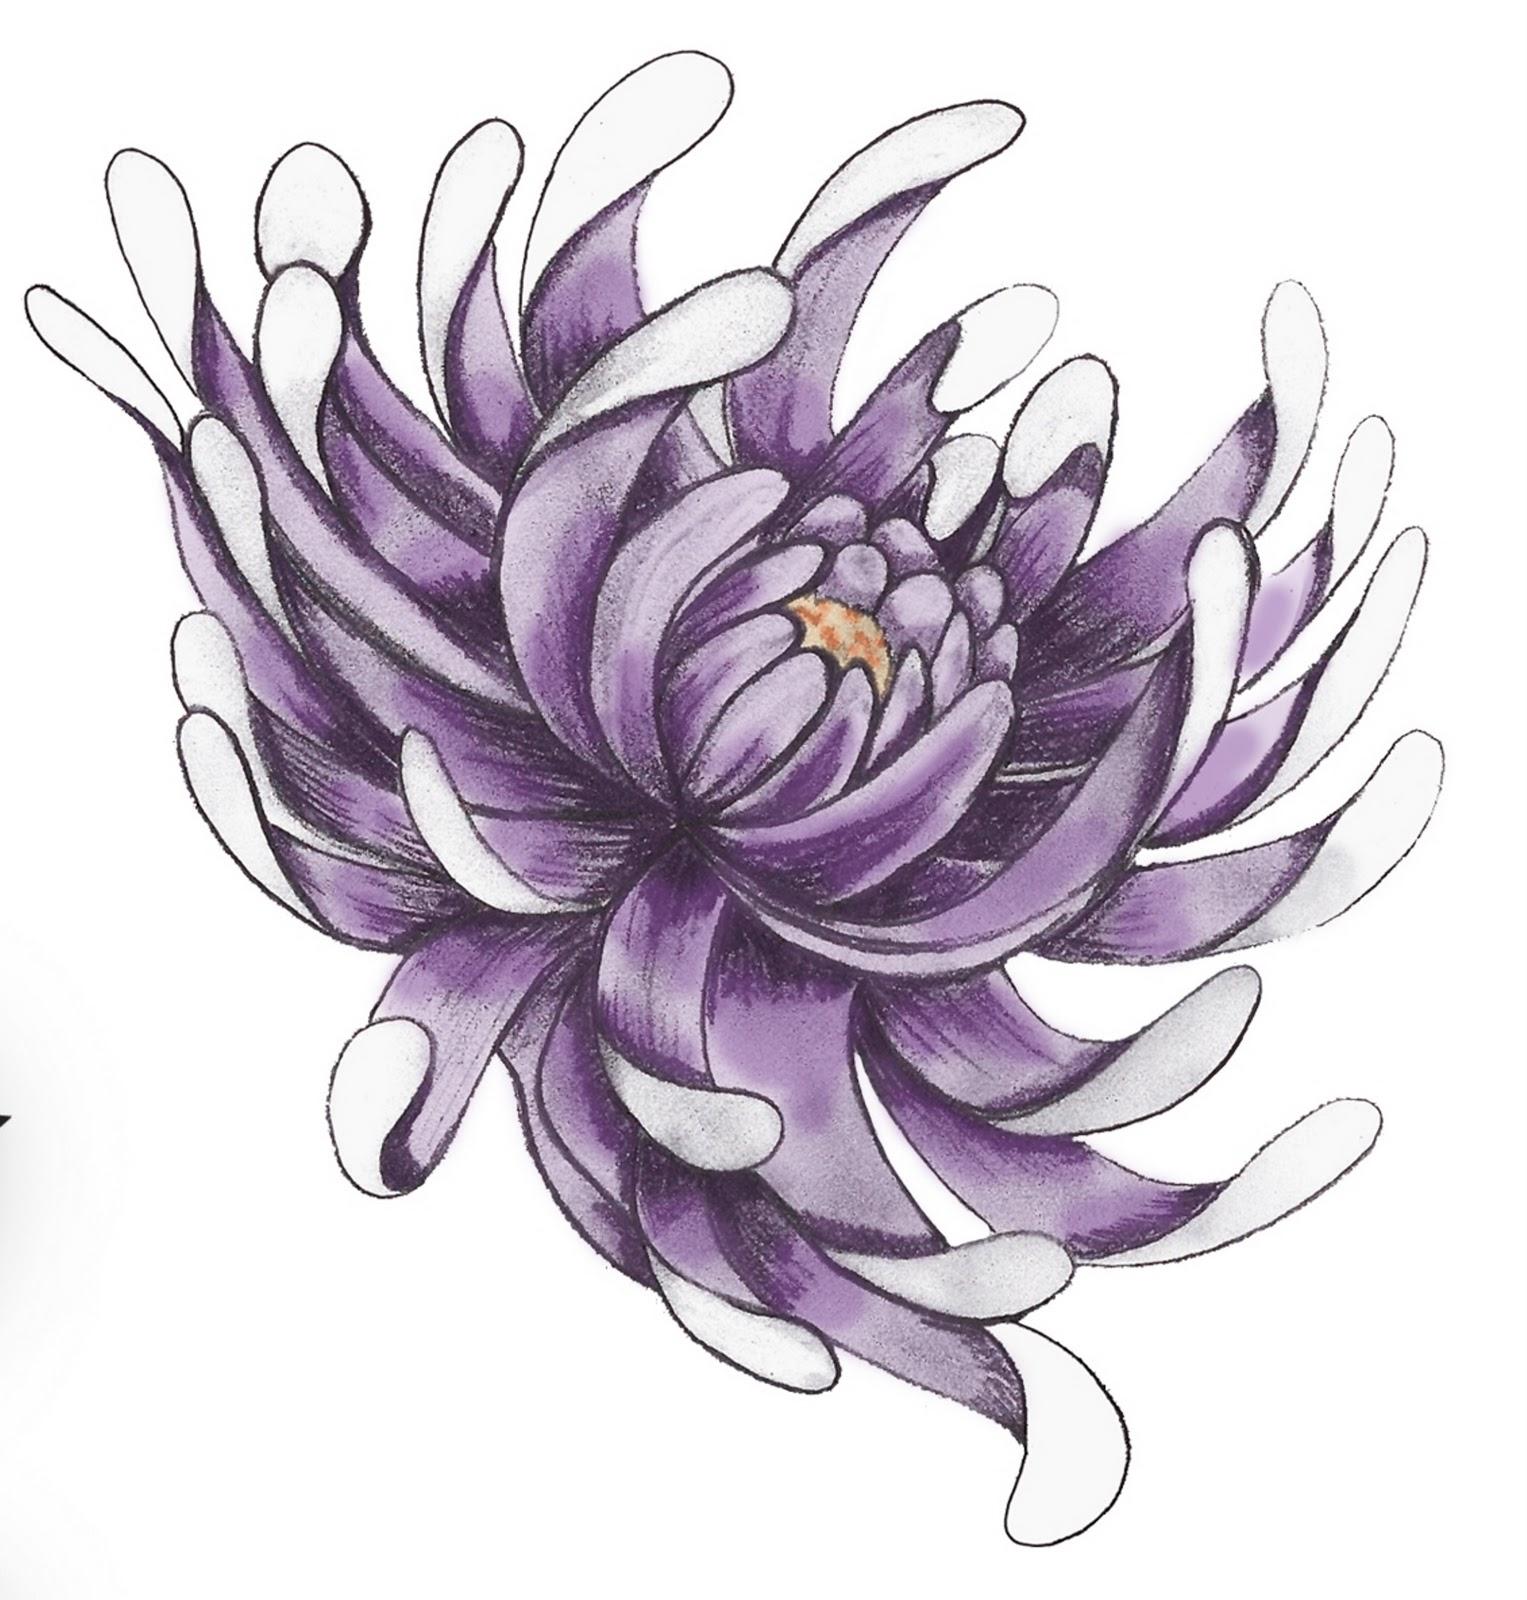 http://3.bp.blogspot.com/_doMzGF0zZBw/TLQ7AZM305I/AAAAAAAAEJw/0aa--JgoQO4/s1600/Flower.jpg